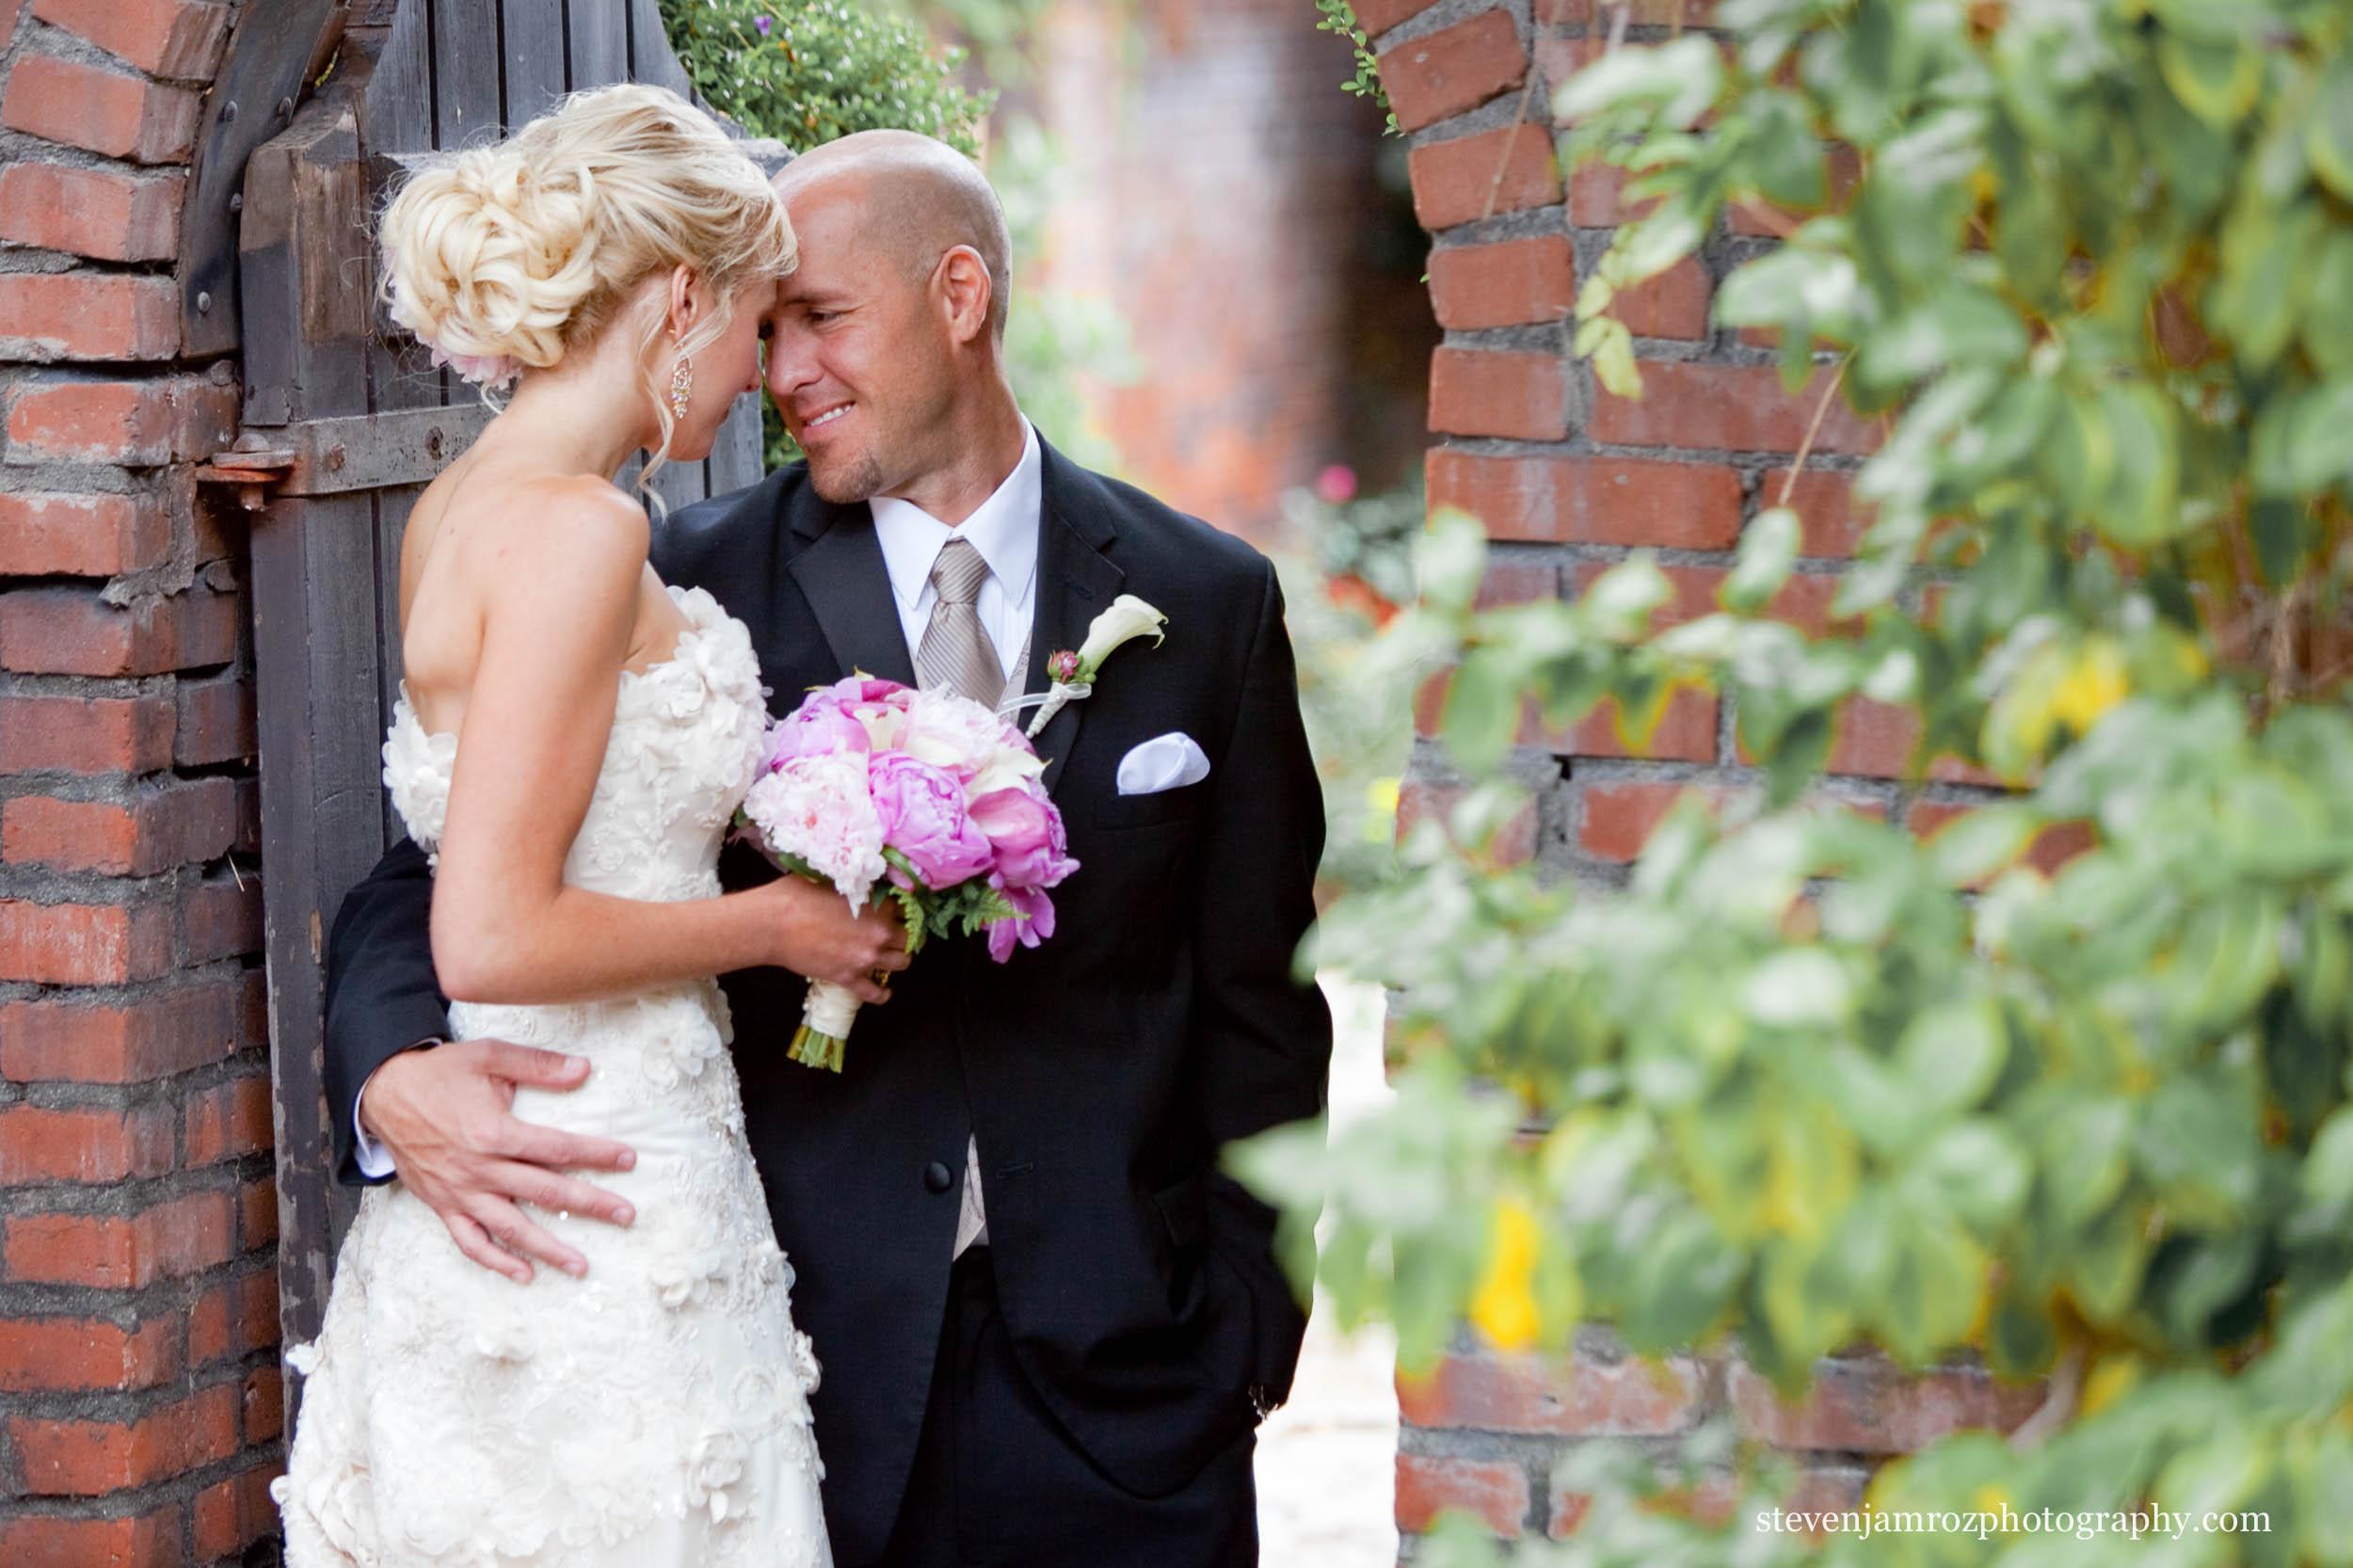 plantation-wedding-raleigh-steven-jamroz-photography-0558.jpg